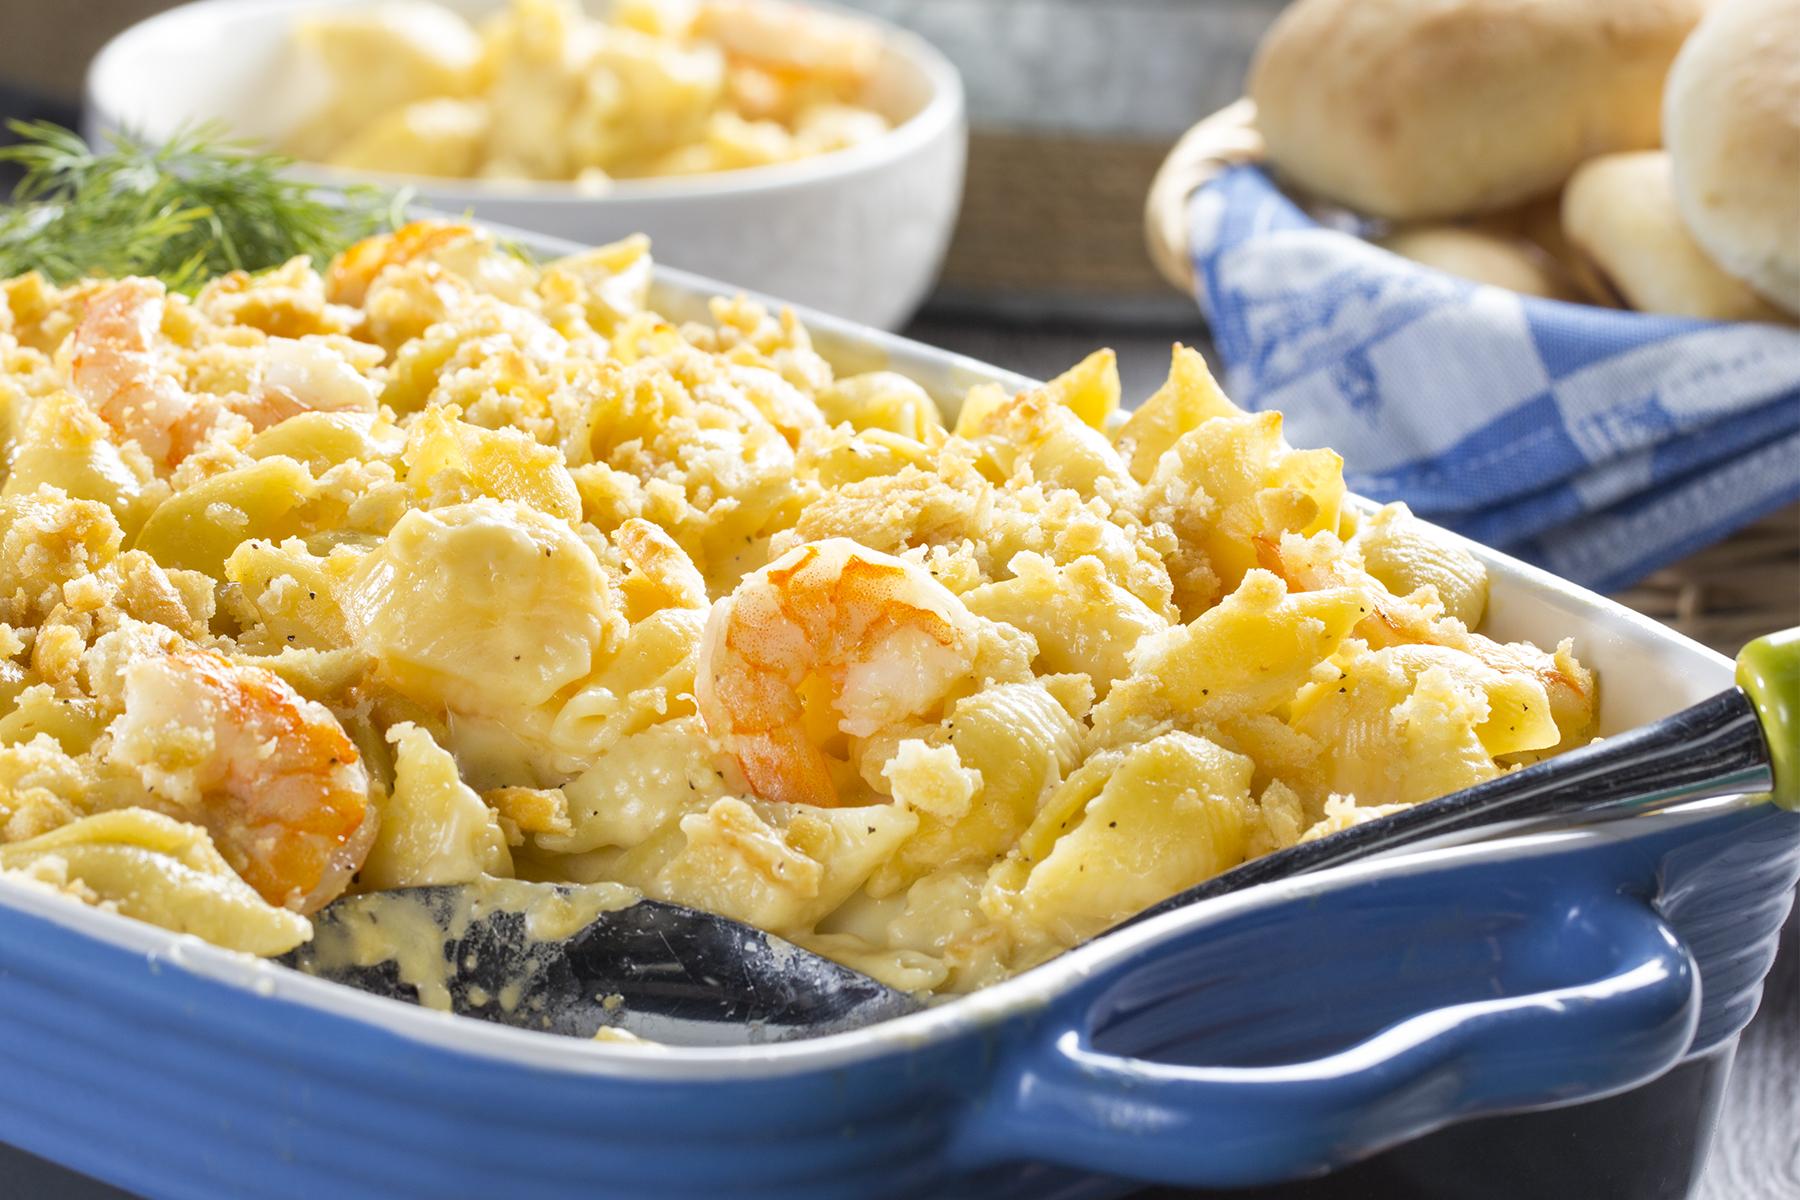 08-06-18-Shrimp-Mac-'n'-Cheese wmv